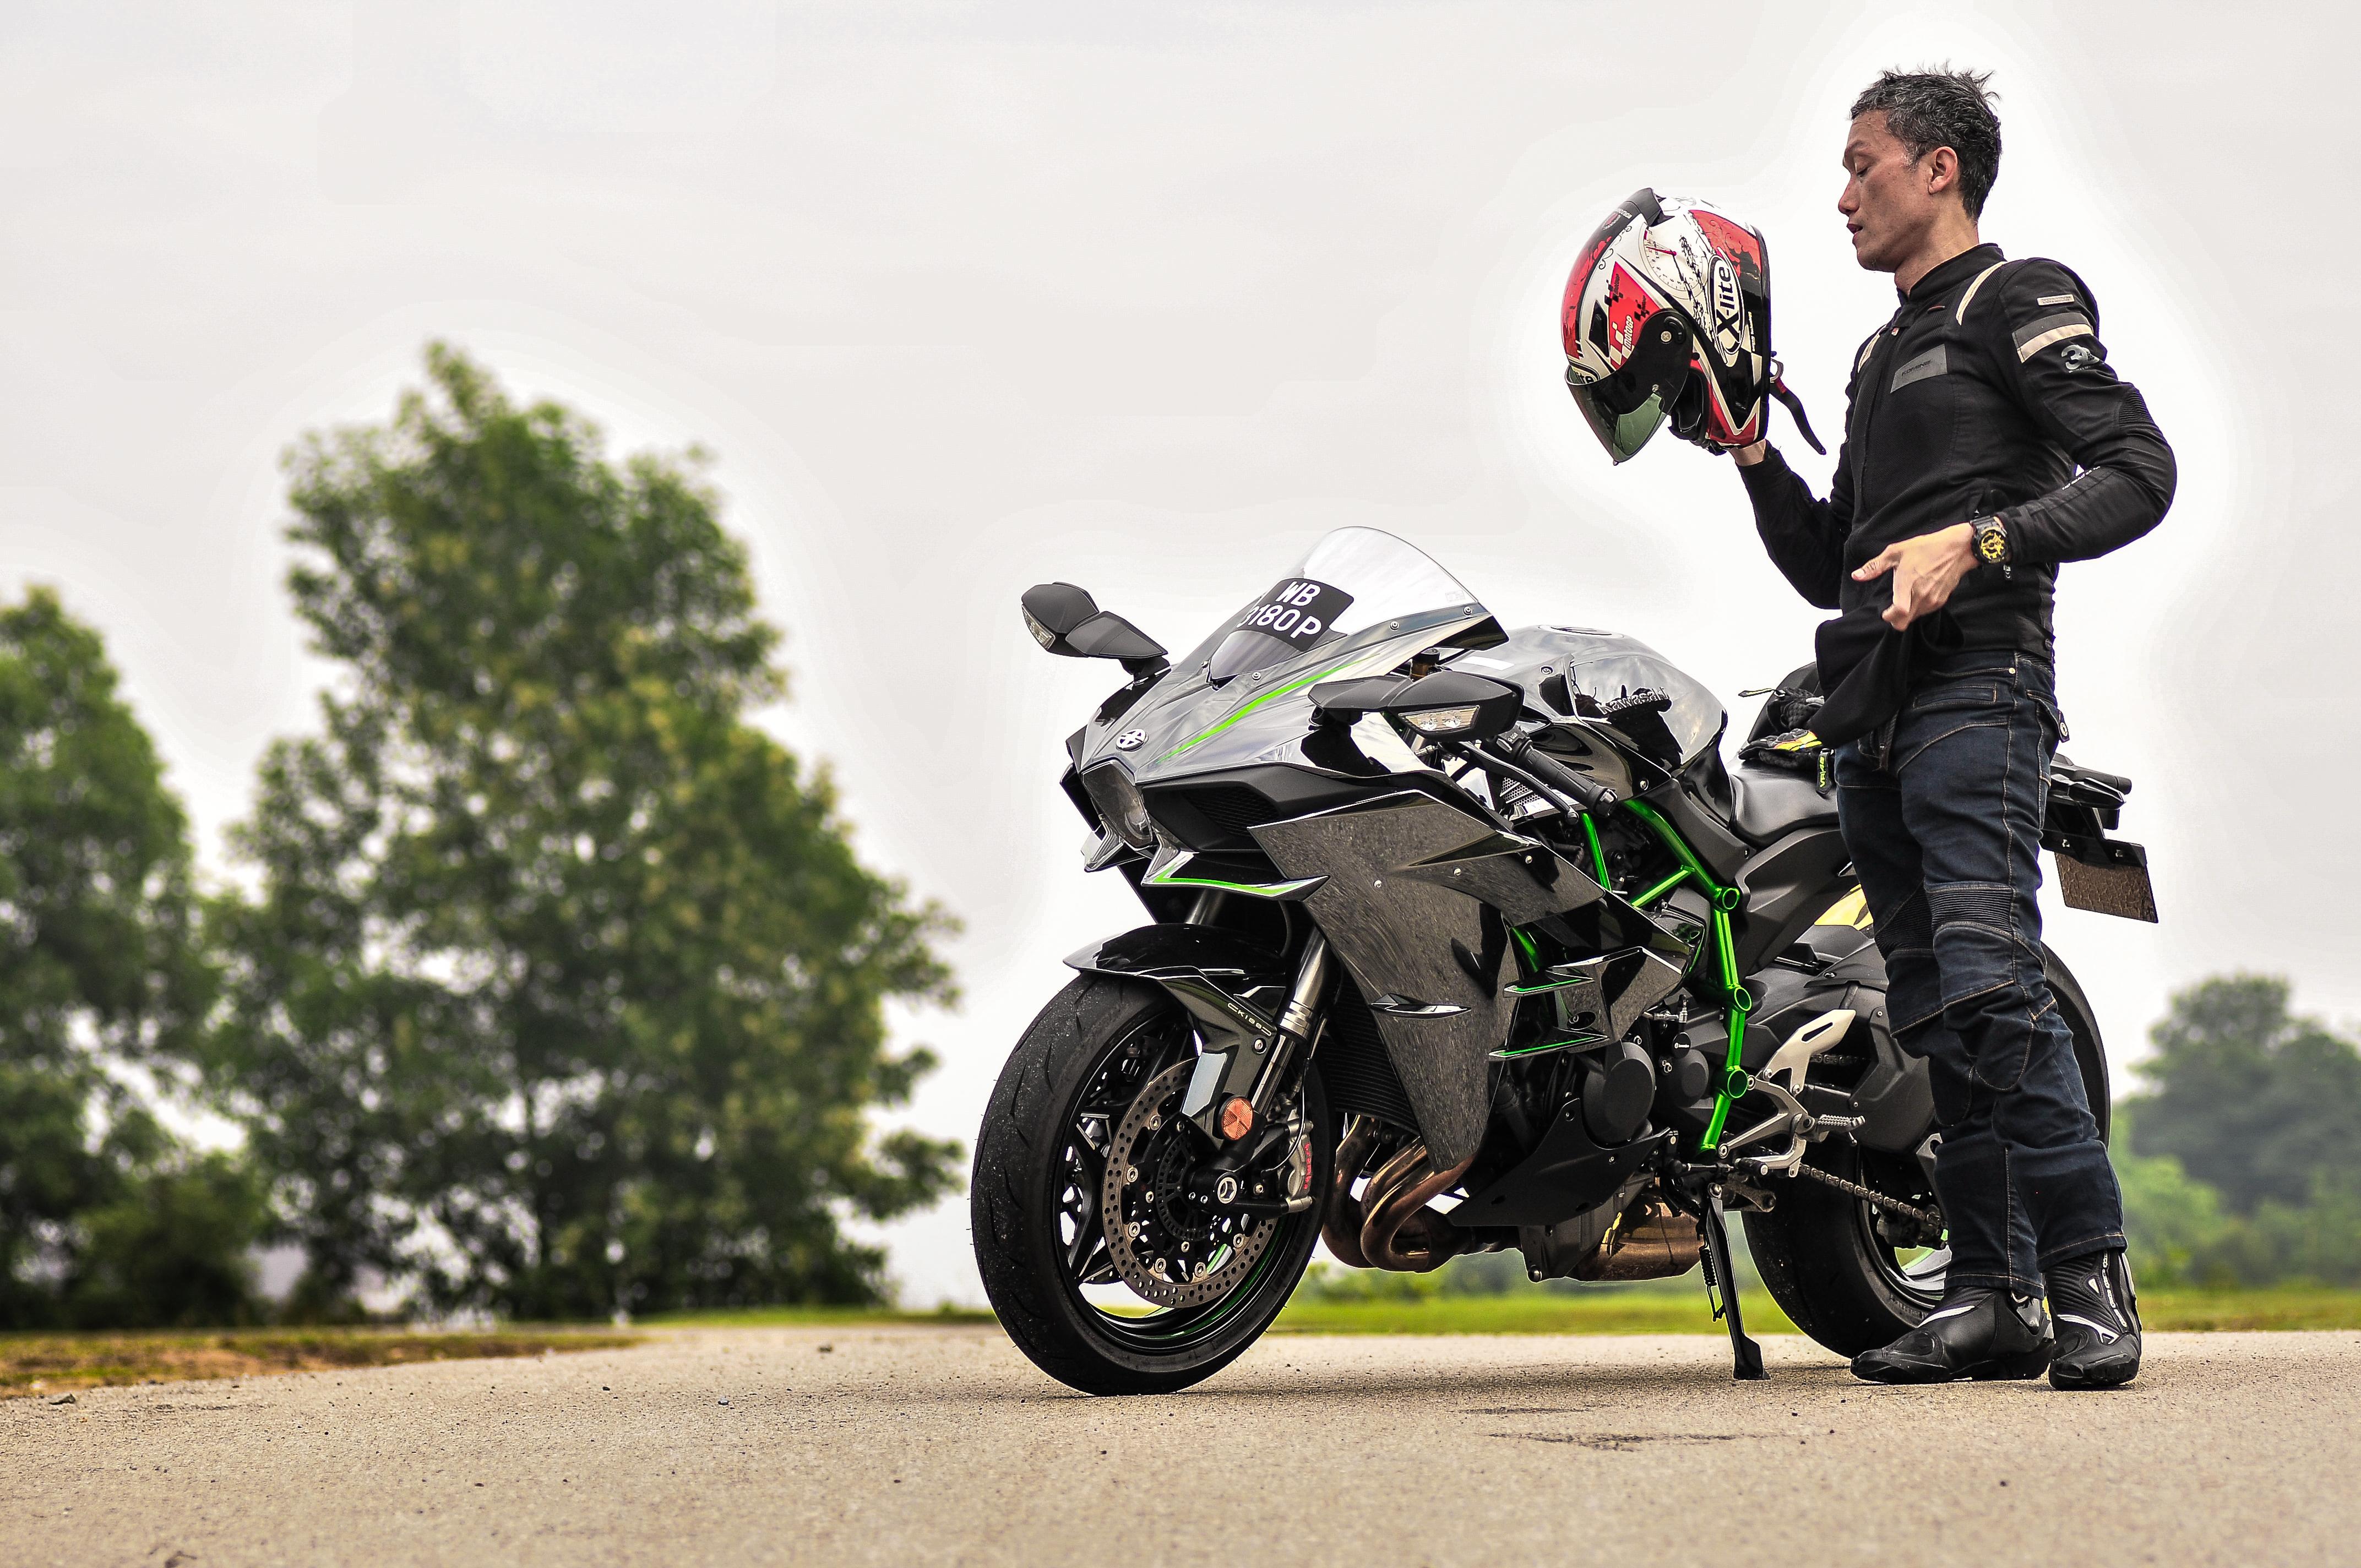 kenapa motosikal rasa lembab?   careta